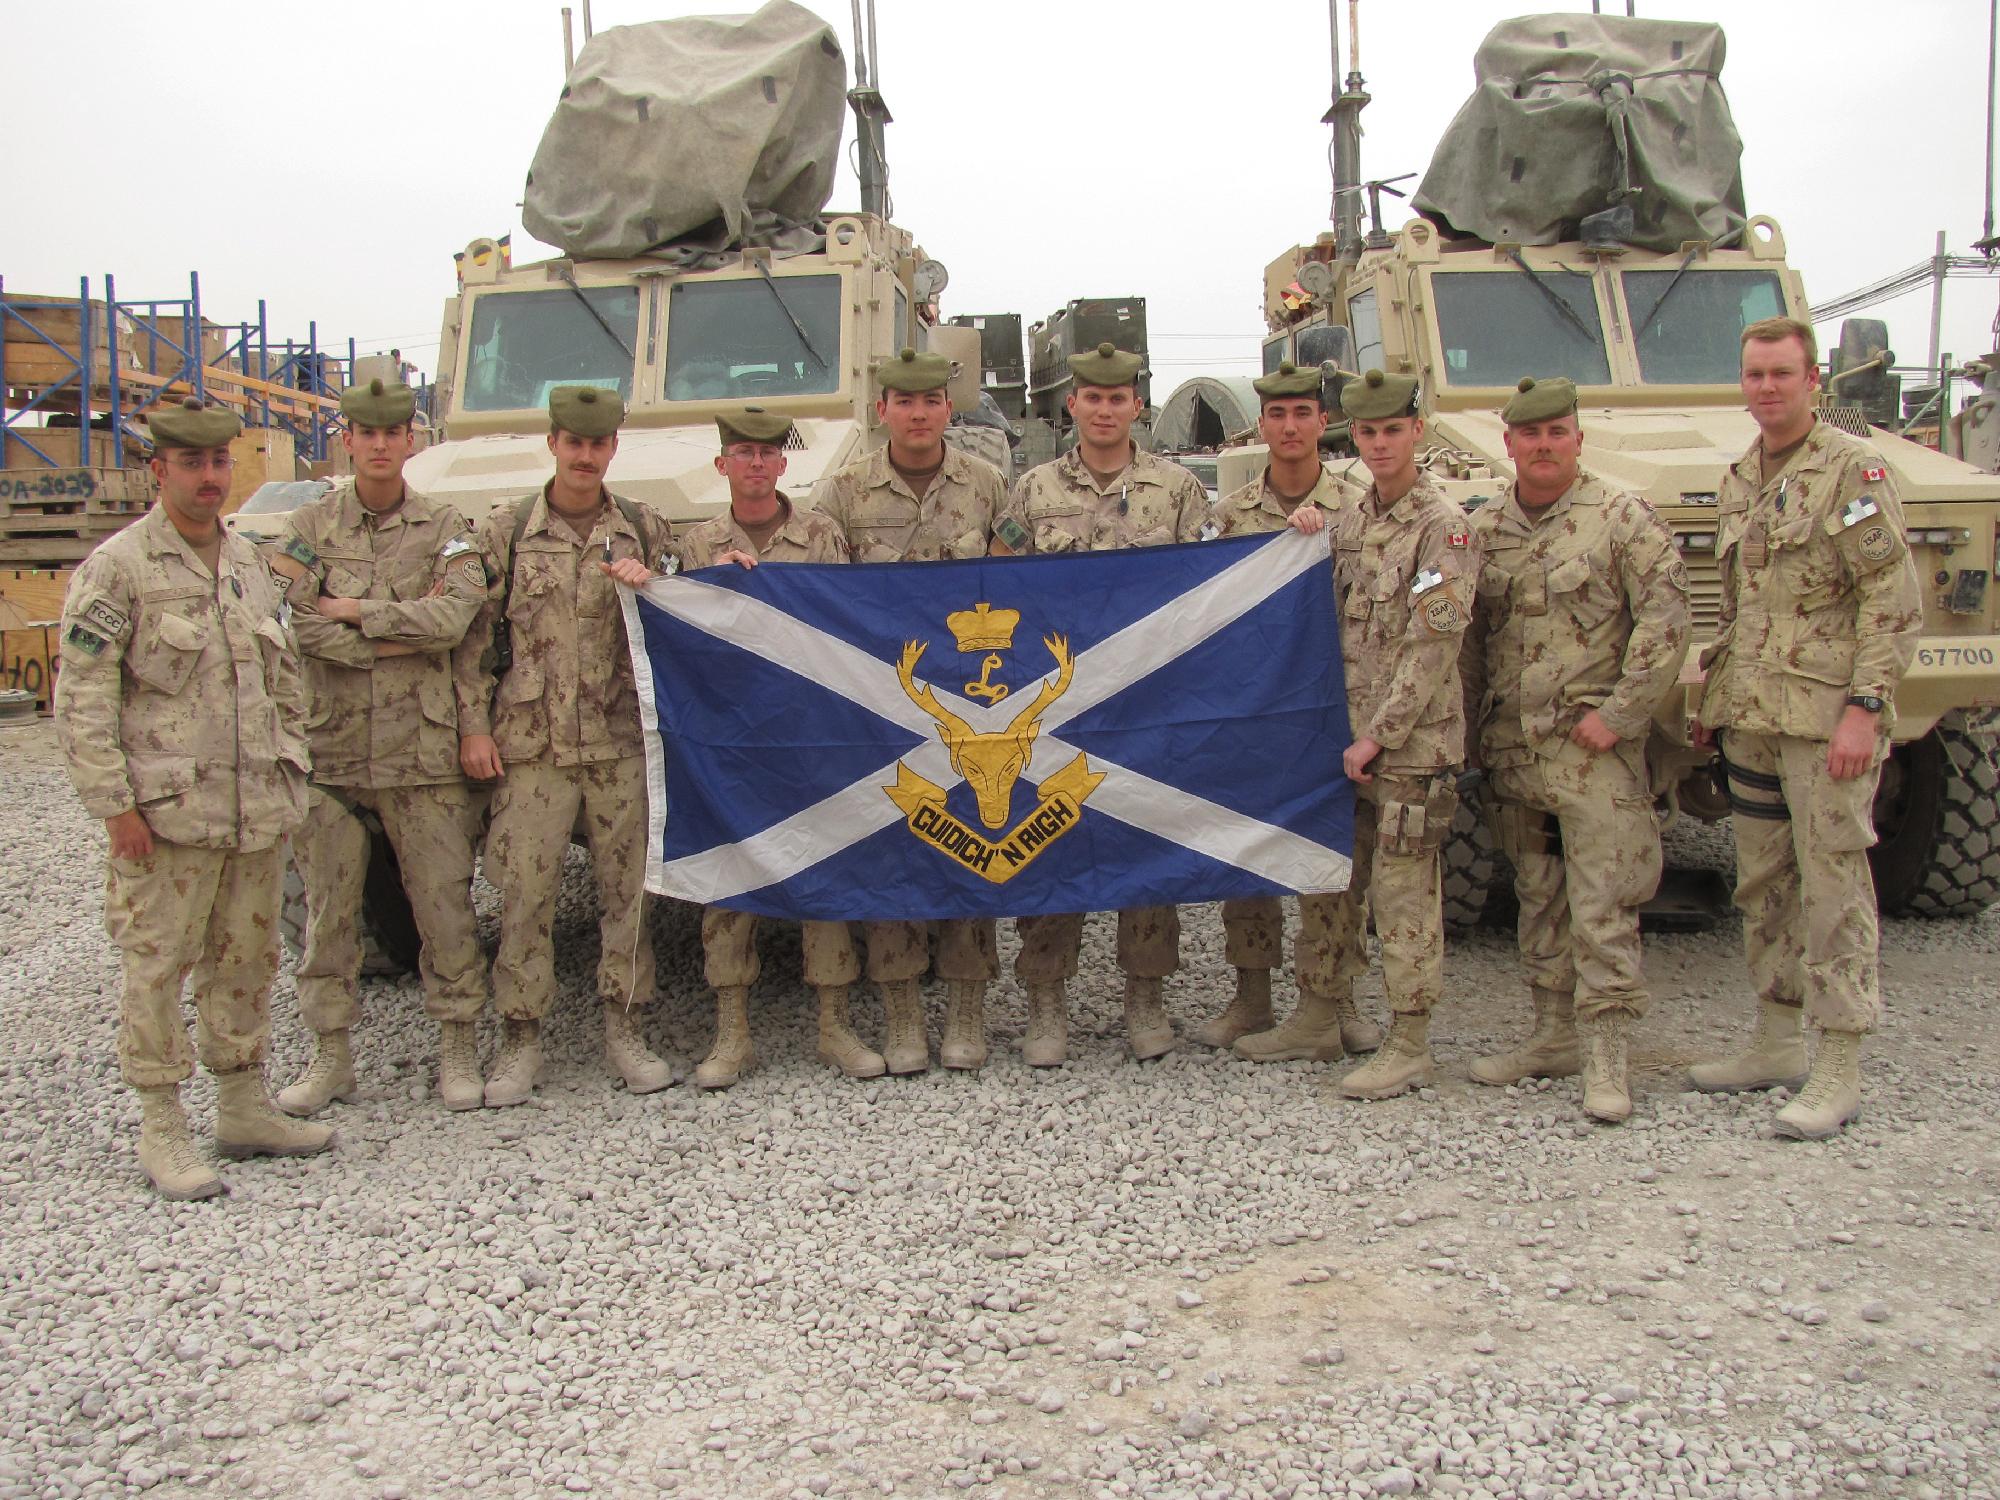 Kandahar Airfield, March 2010: Some of the Seaforth Highlanders who were members of the Convoy Escort Platoon. L-R, Corporals Mike Almeida, Matt Swanston, Bryden Telford, Brett Tyre, Mackenzie Robinson, Grant Belich, Ben Chau, Kyle Yorston, Trevor Street, Captain Jason MacEwan.